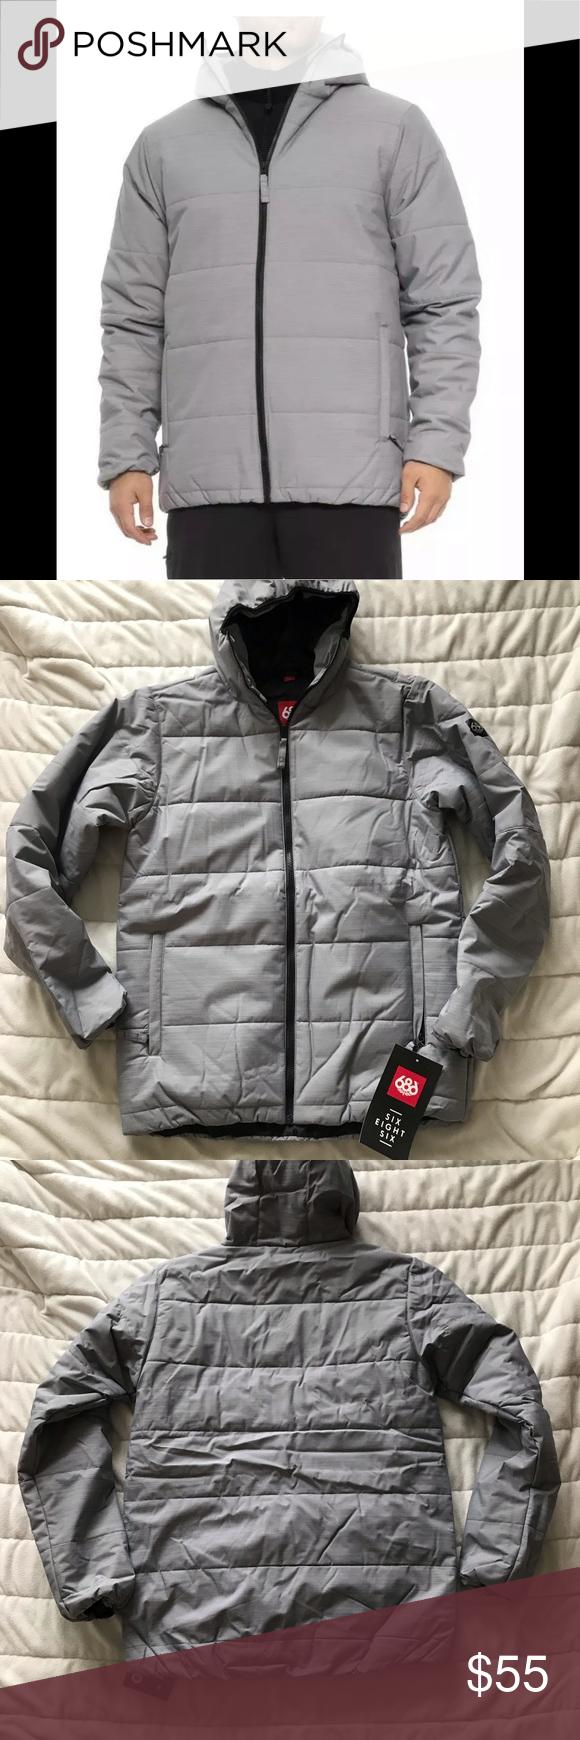 686 Mens Warmix Puffy Jacket